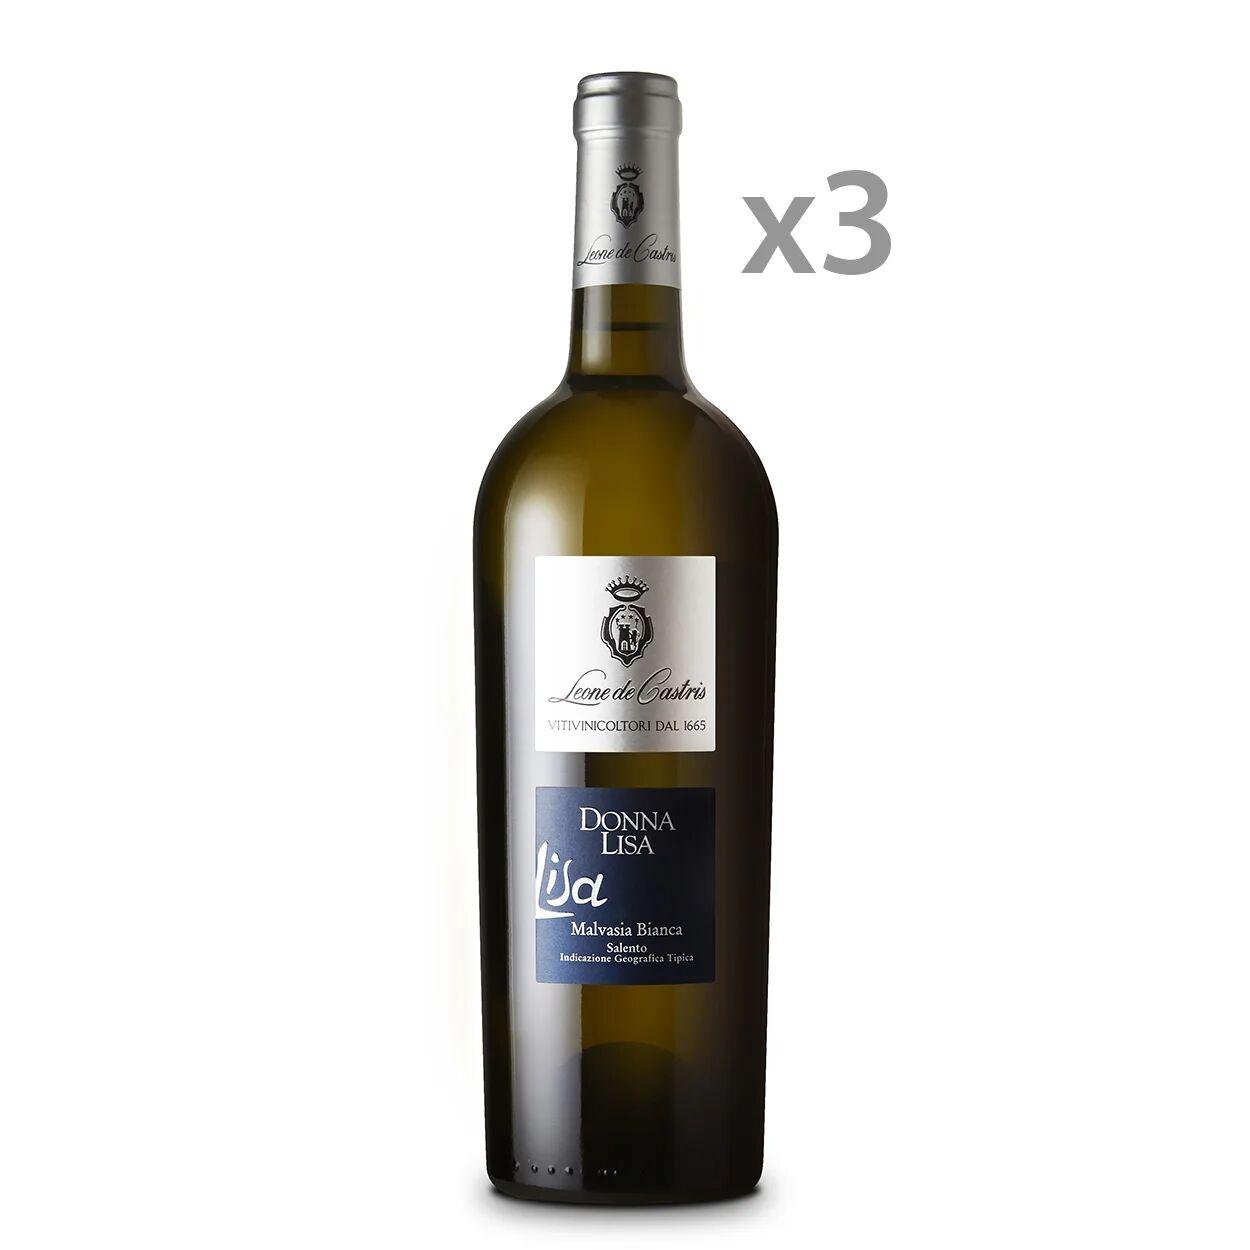 leone 3 bottiglie - donna lisa malvasia bianca igt salento 2018